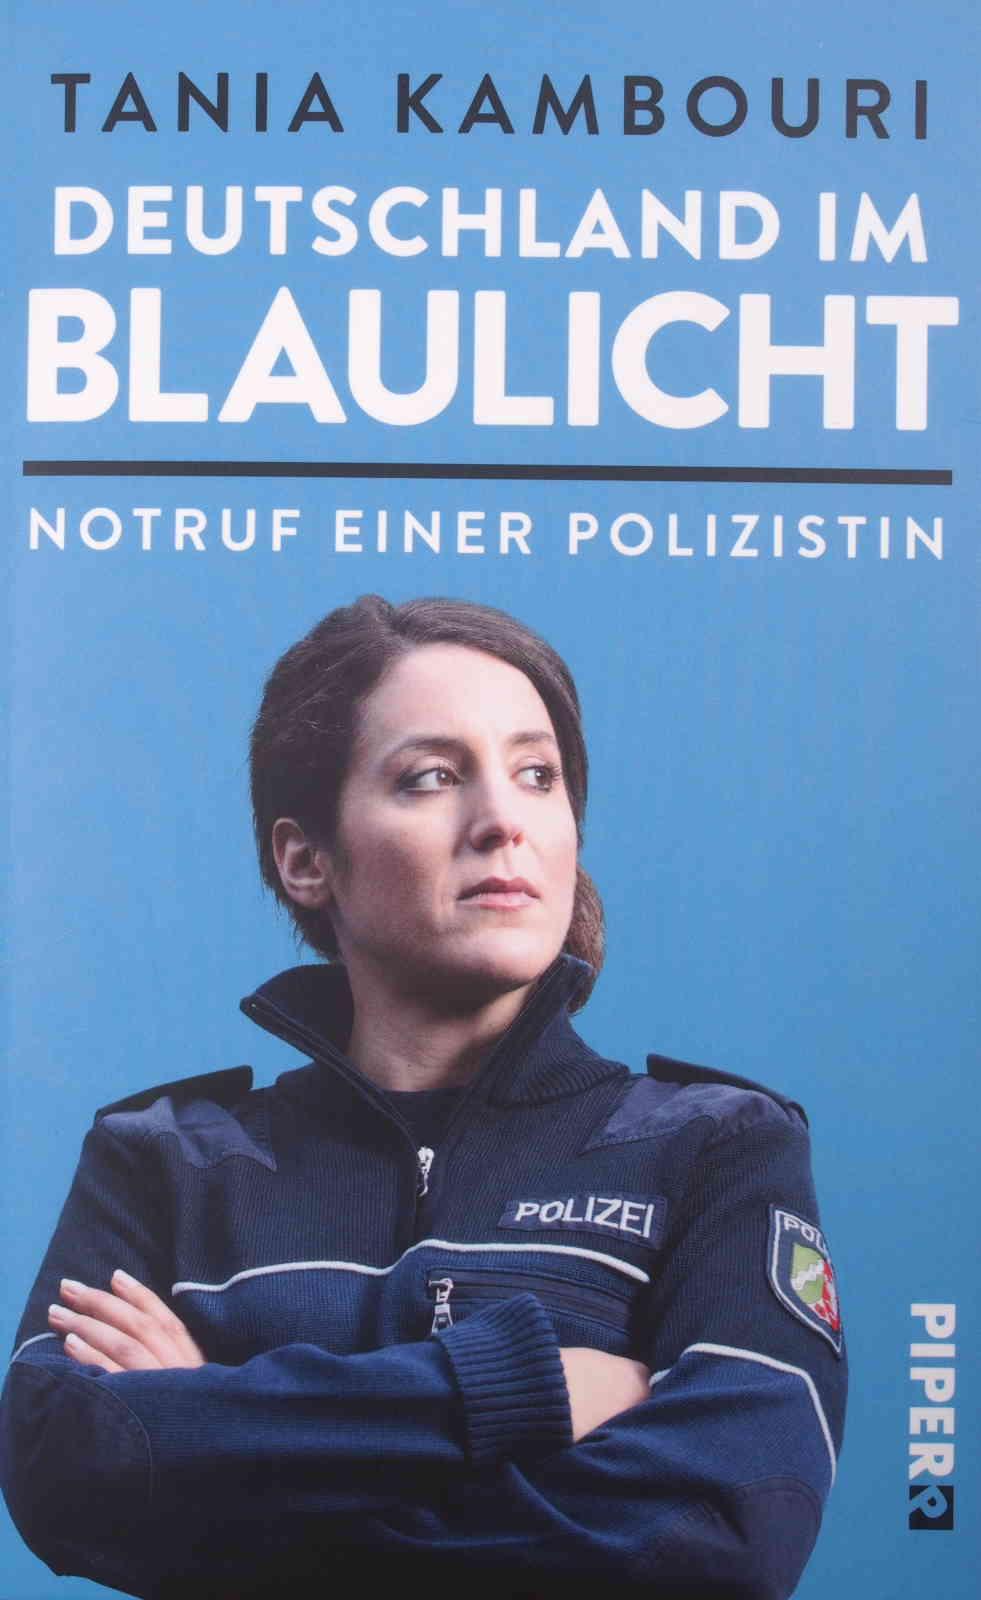 Tania Kambouri - Deutschland im Blaulicht